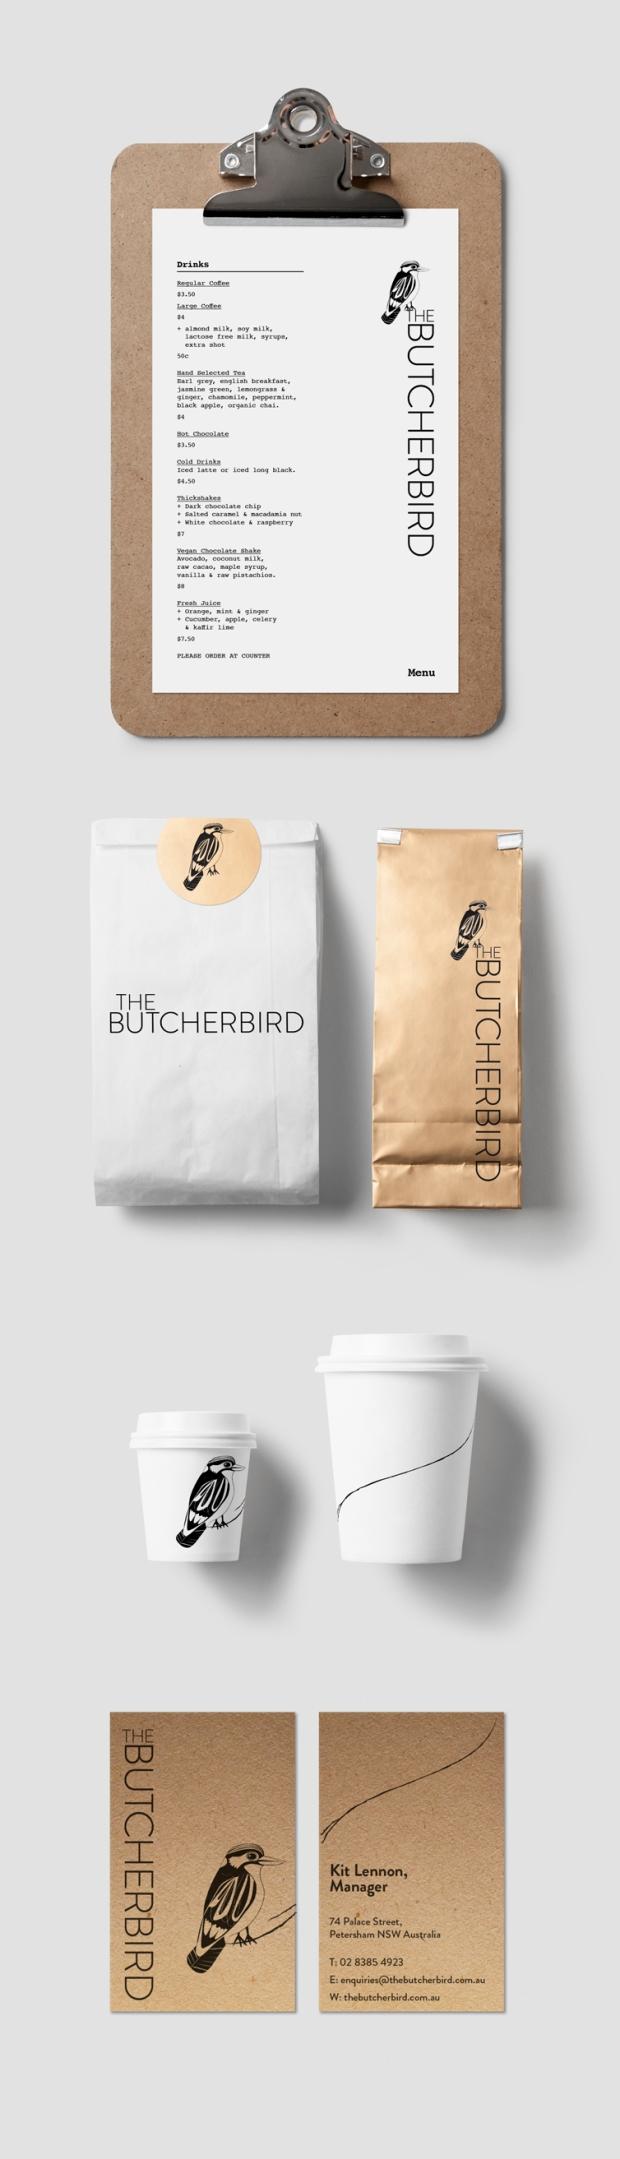 the-butcherbird-branding-mobile